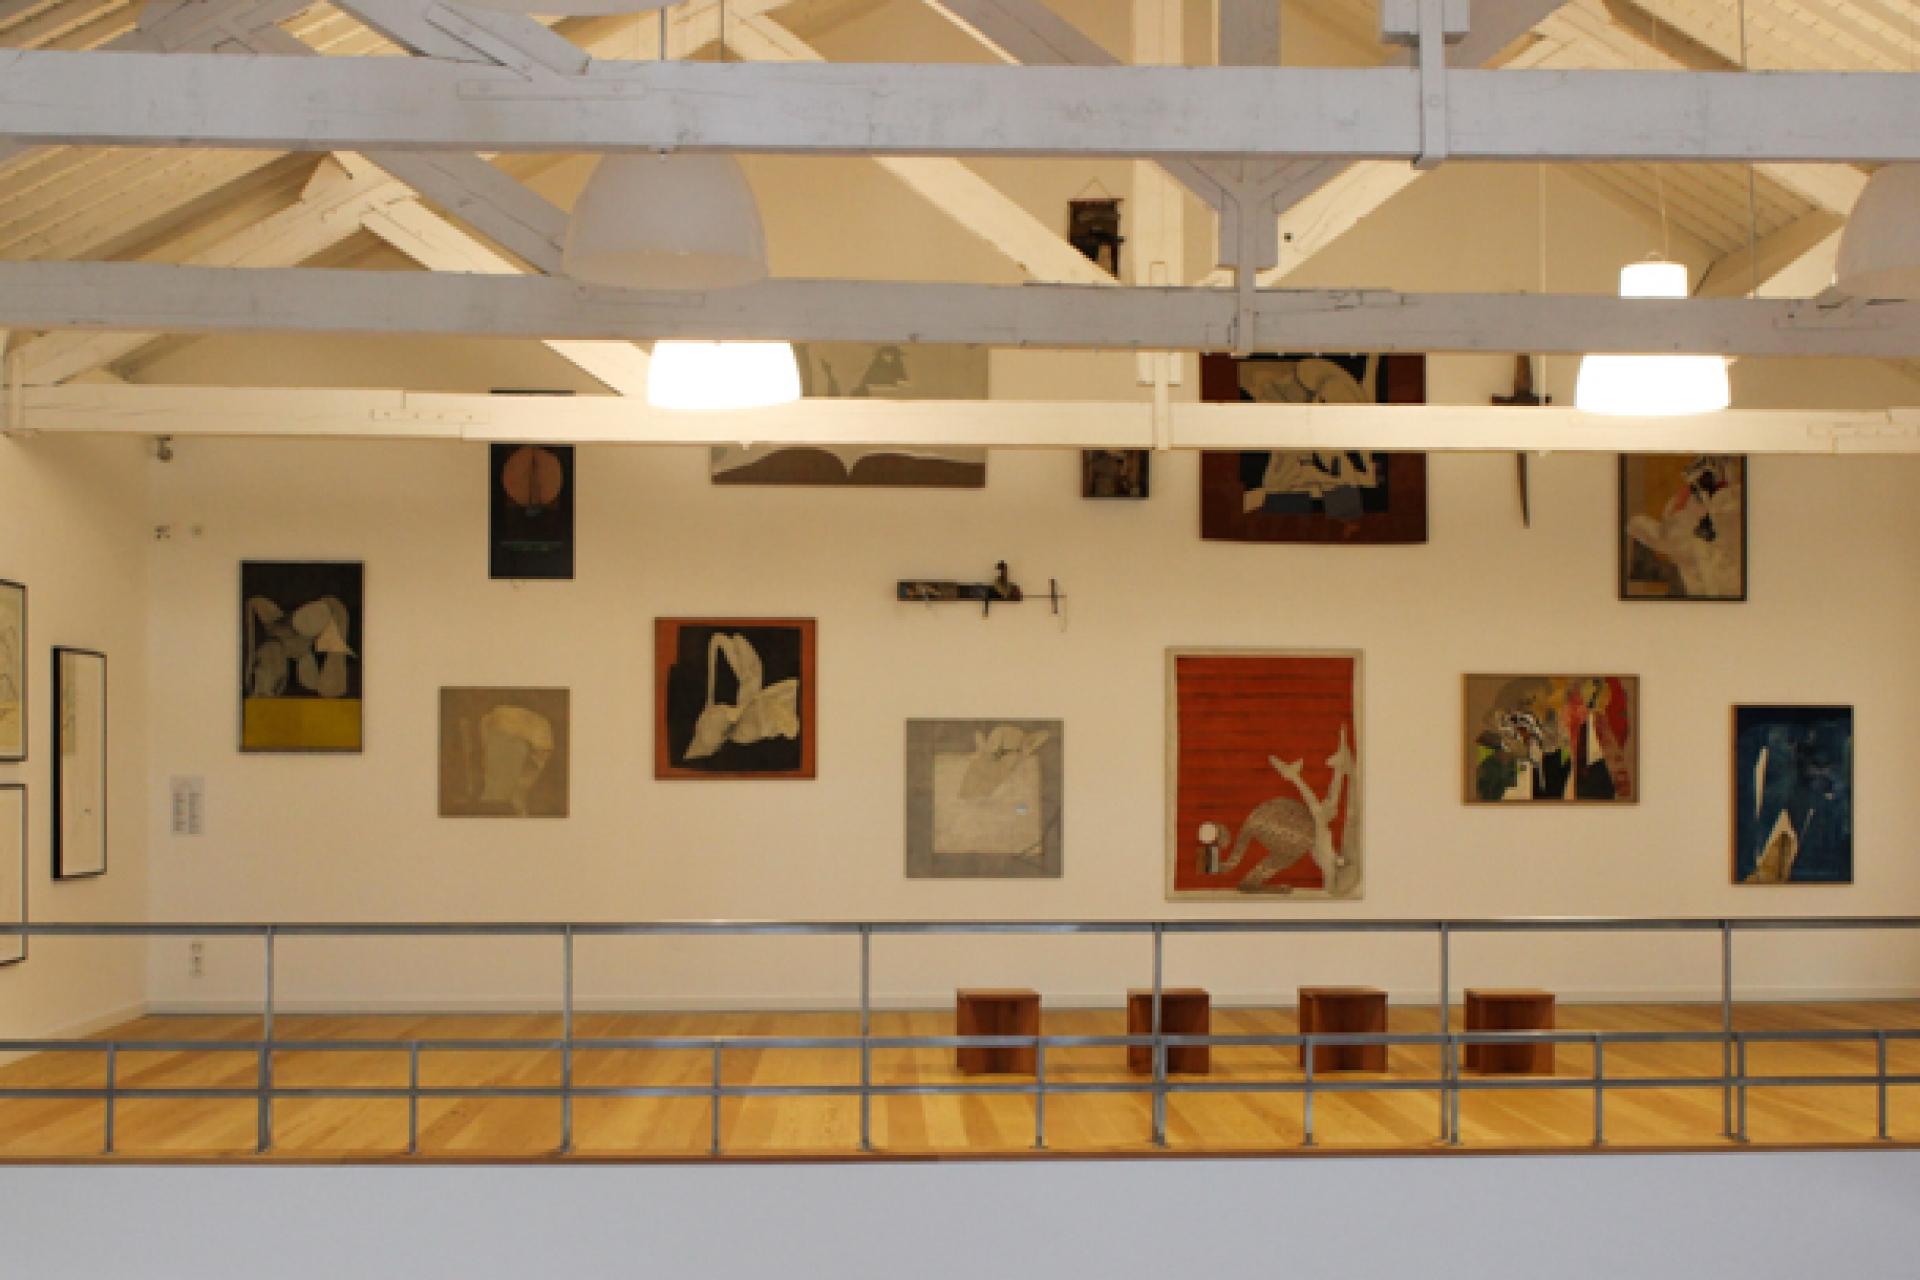 LisboaCool_Visitar_Atelier-Museu Júlio Pomar